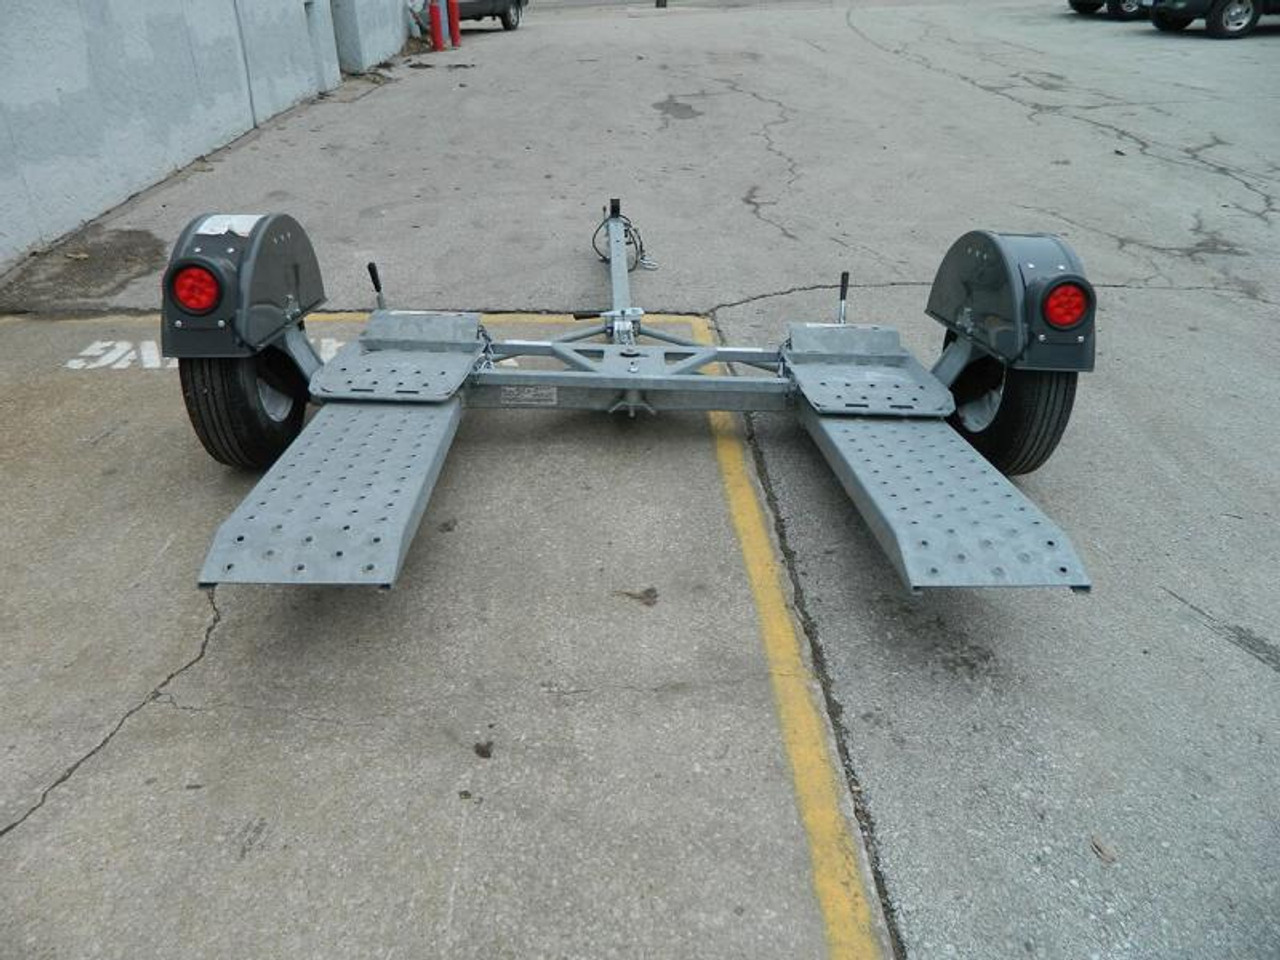 CGTD76 --- 2020 Croft Galvanized Tow Dolly - No Brakes #C0244